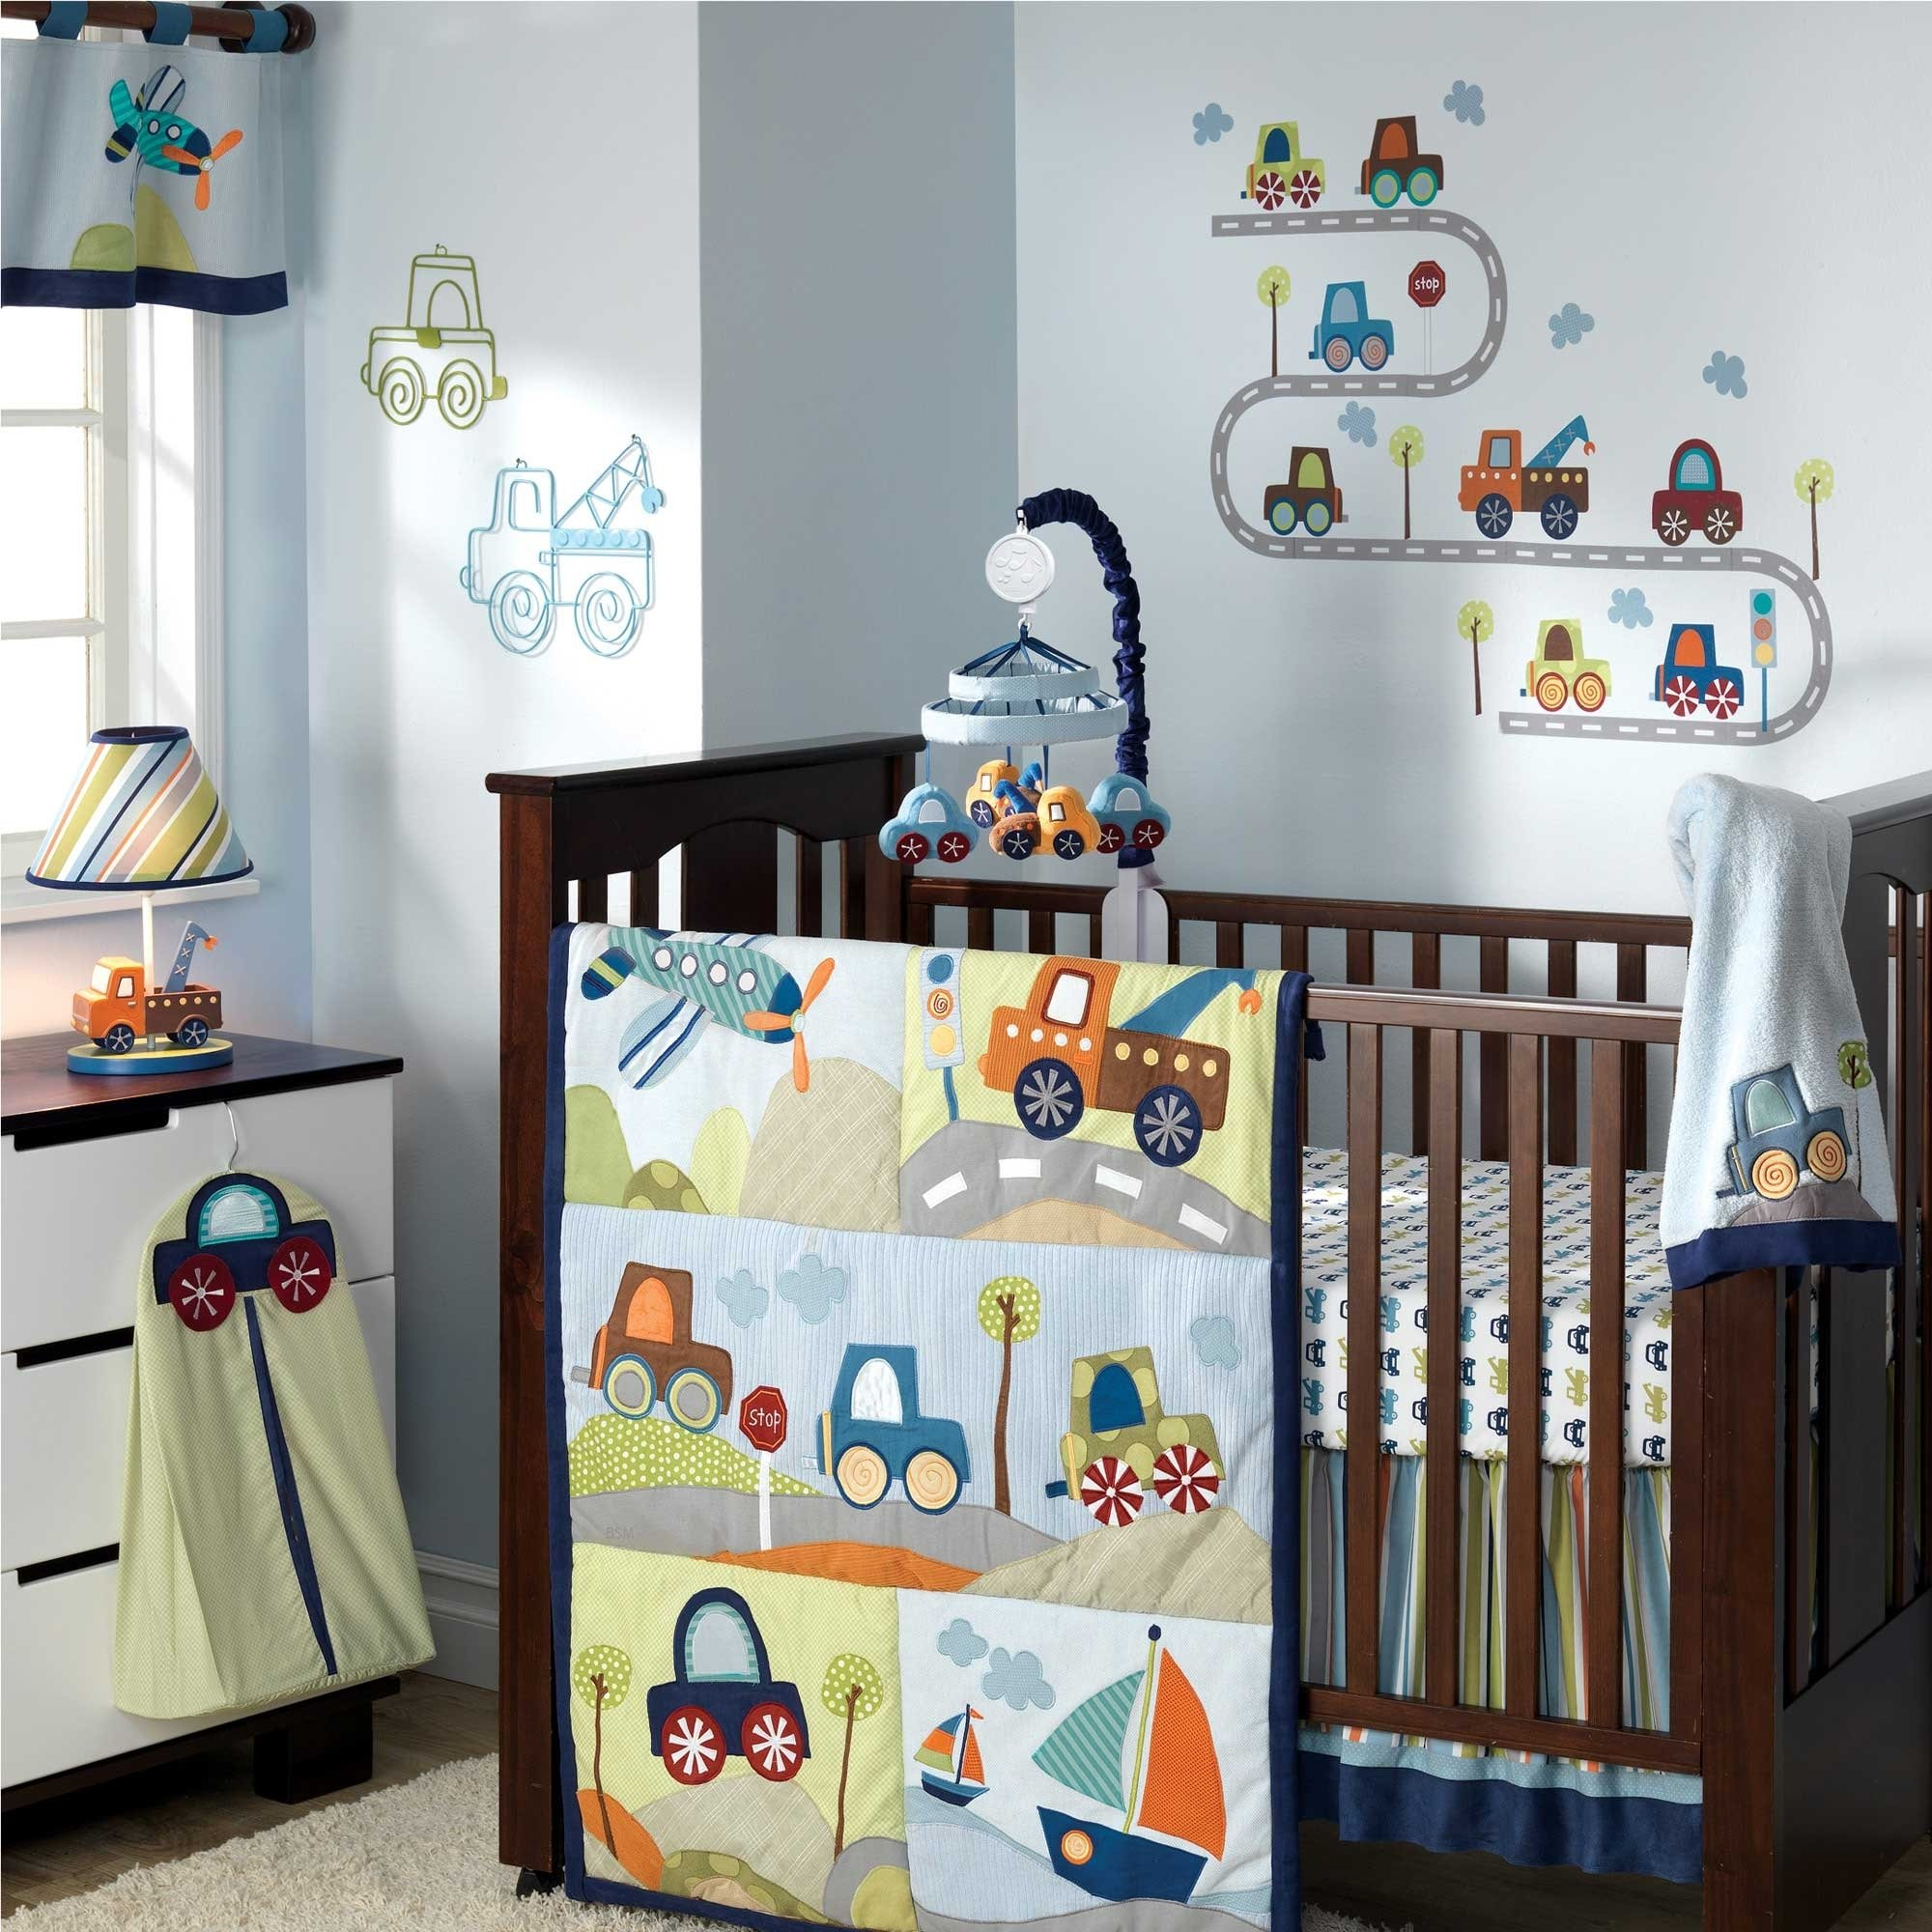 10 Great Baby Room Ideas For A Boy baby nursery ideas baby nursery ideas boy disneyhemes fabulous 1 2020